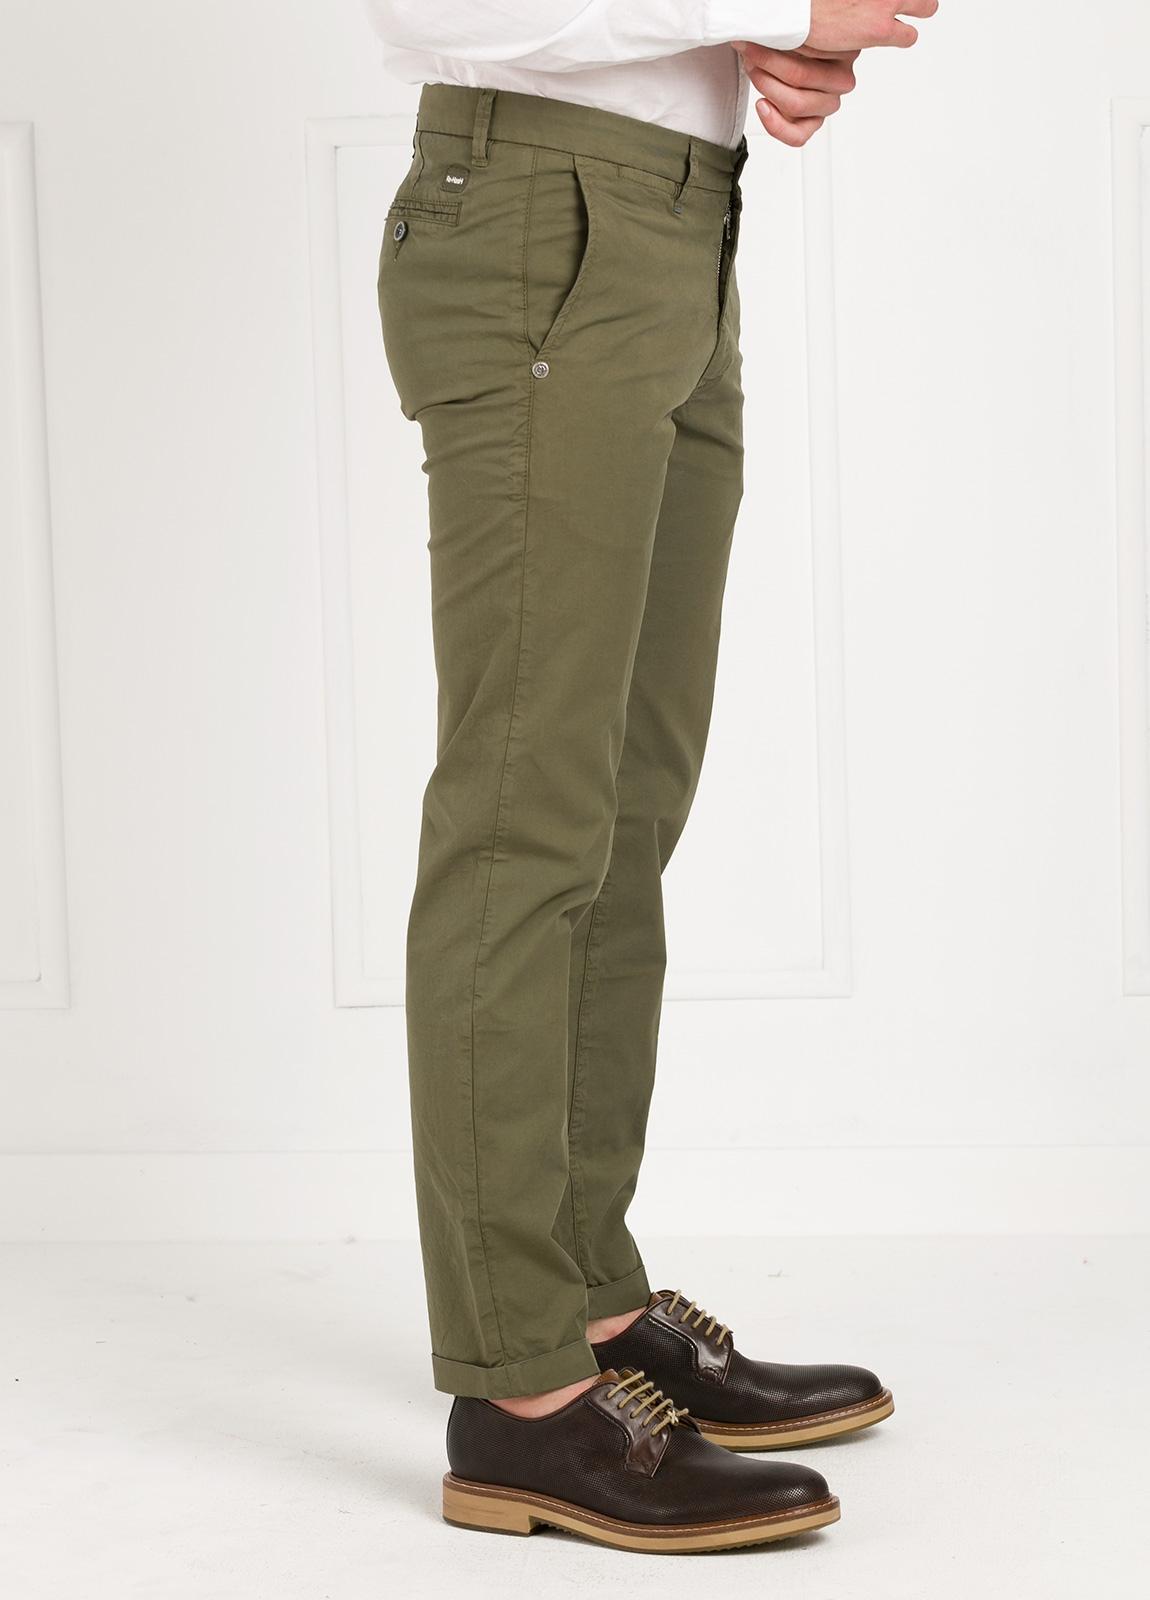 Pantalón sport modelo MUCHA P 249 color kaki. Algodón y elastáno. - Ítem3